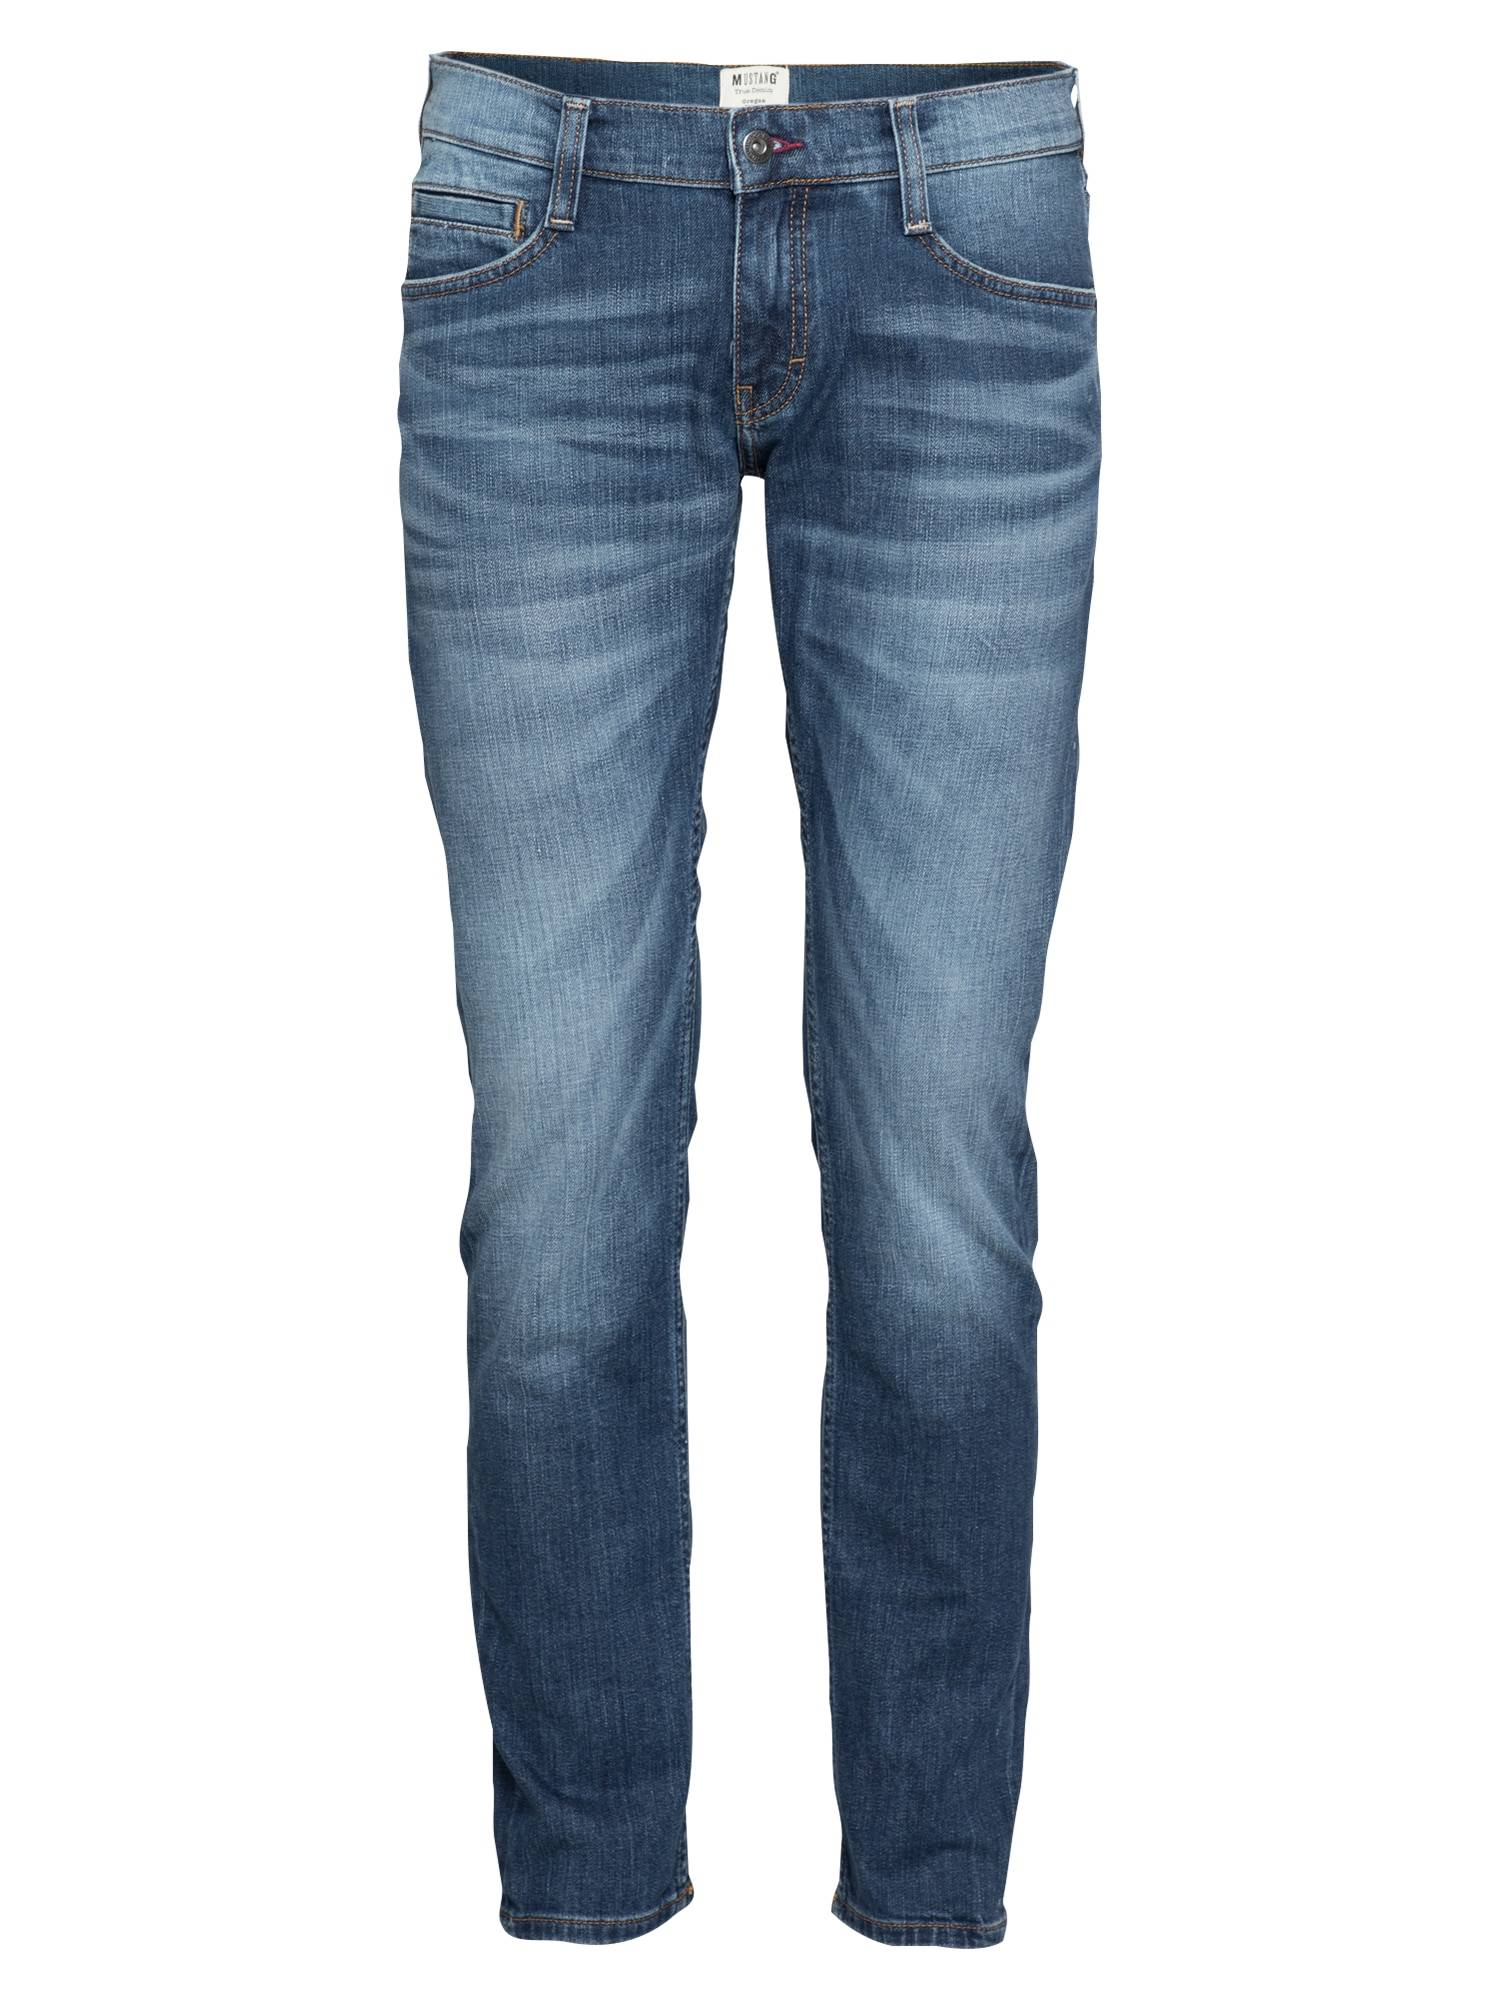 MUSTANG Jean 'Oregon'  - Bleu - Taille: 29 - male